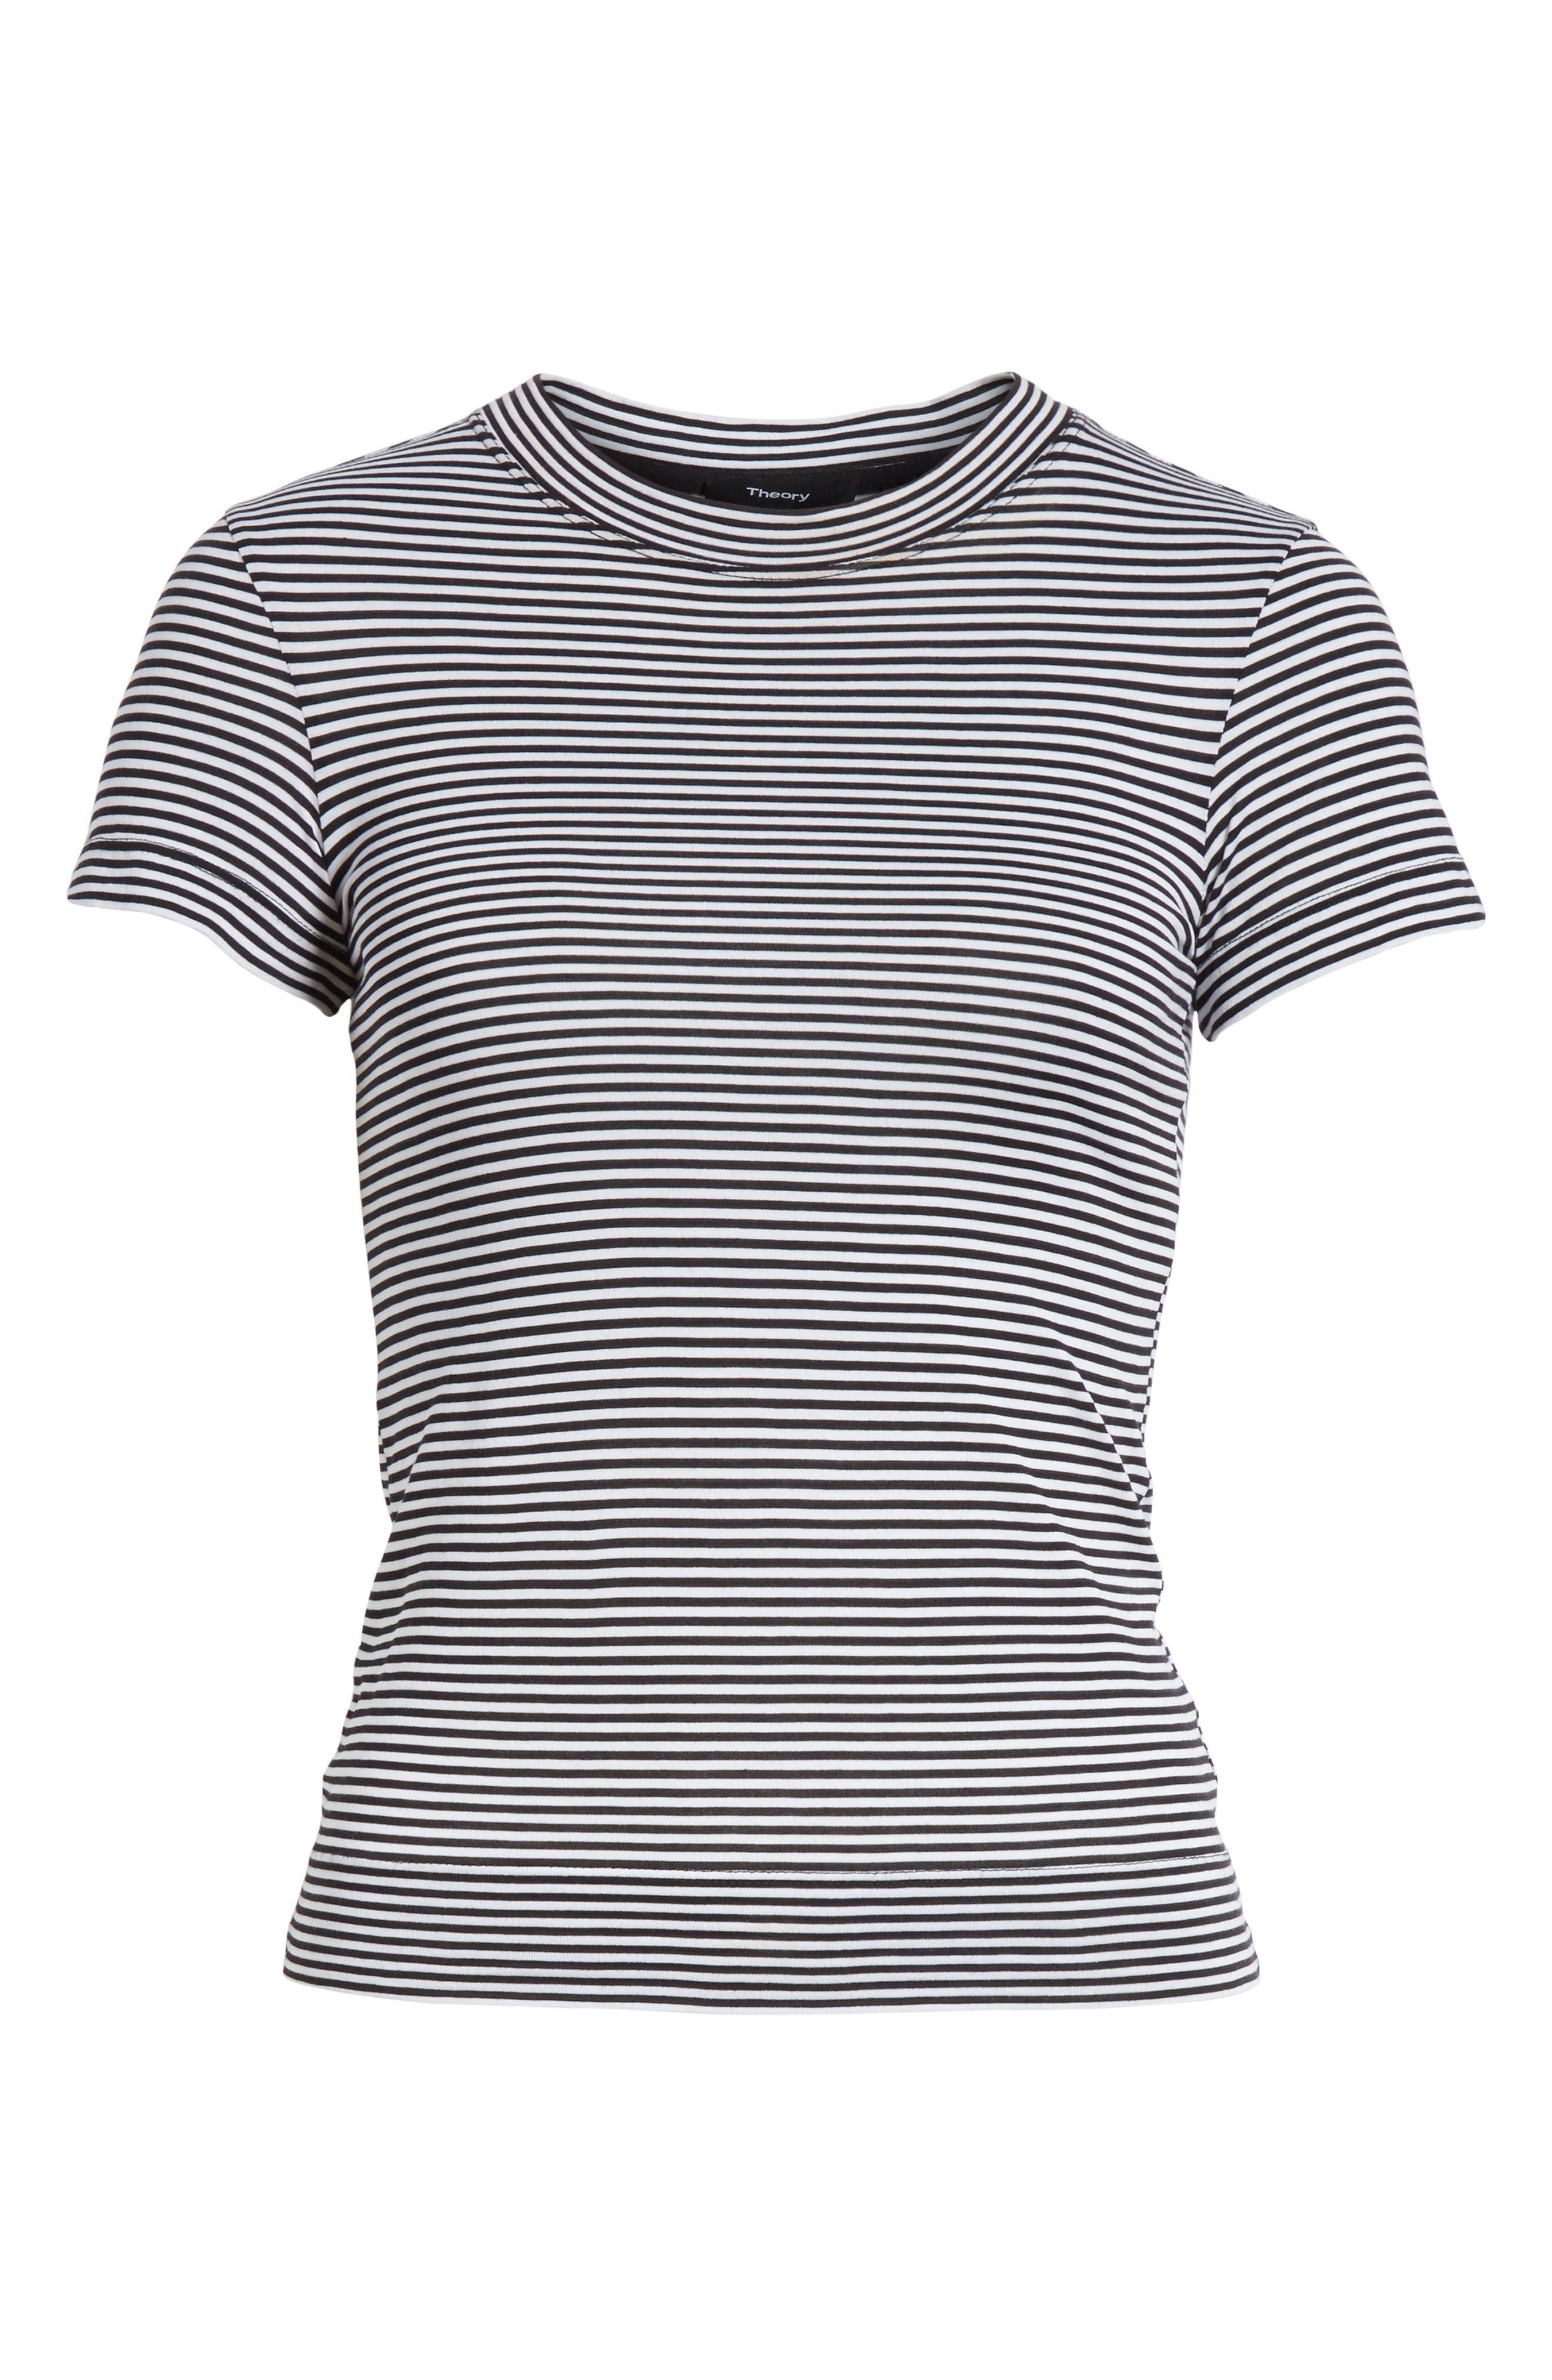 Apex Stripe Crop Tee,                             Alternate thumbnail 6, color,                             Black/ White